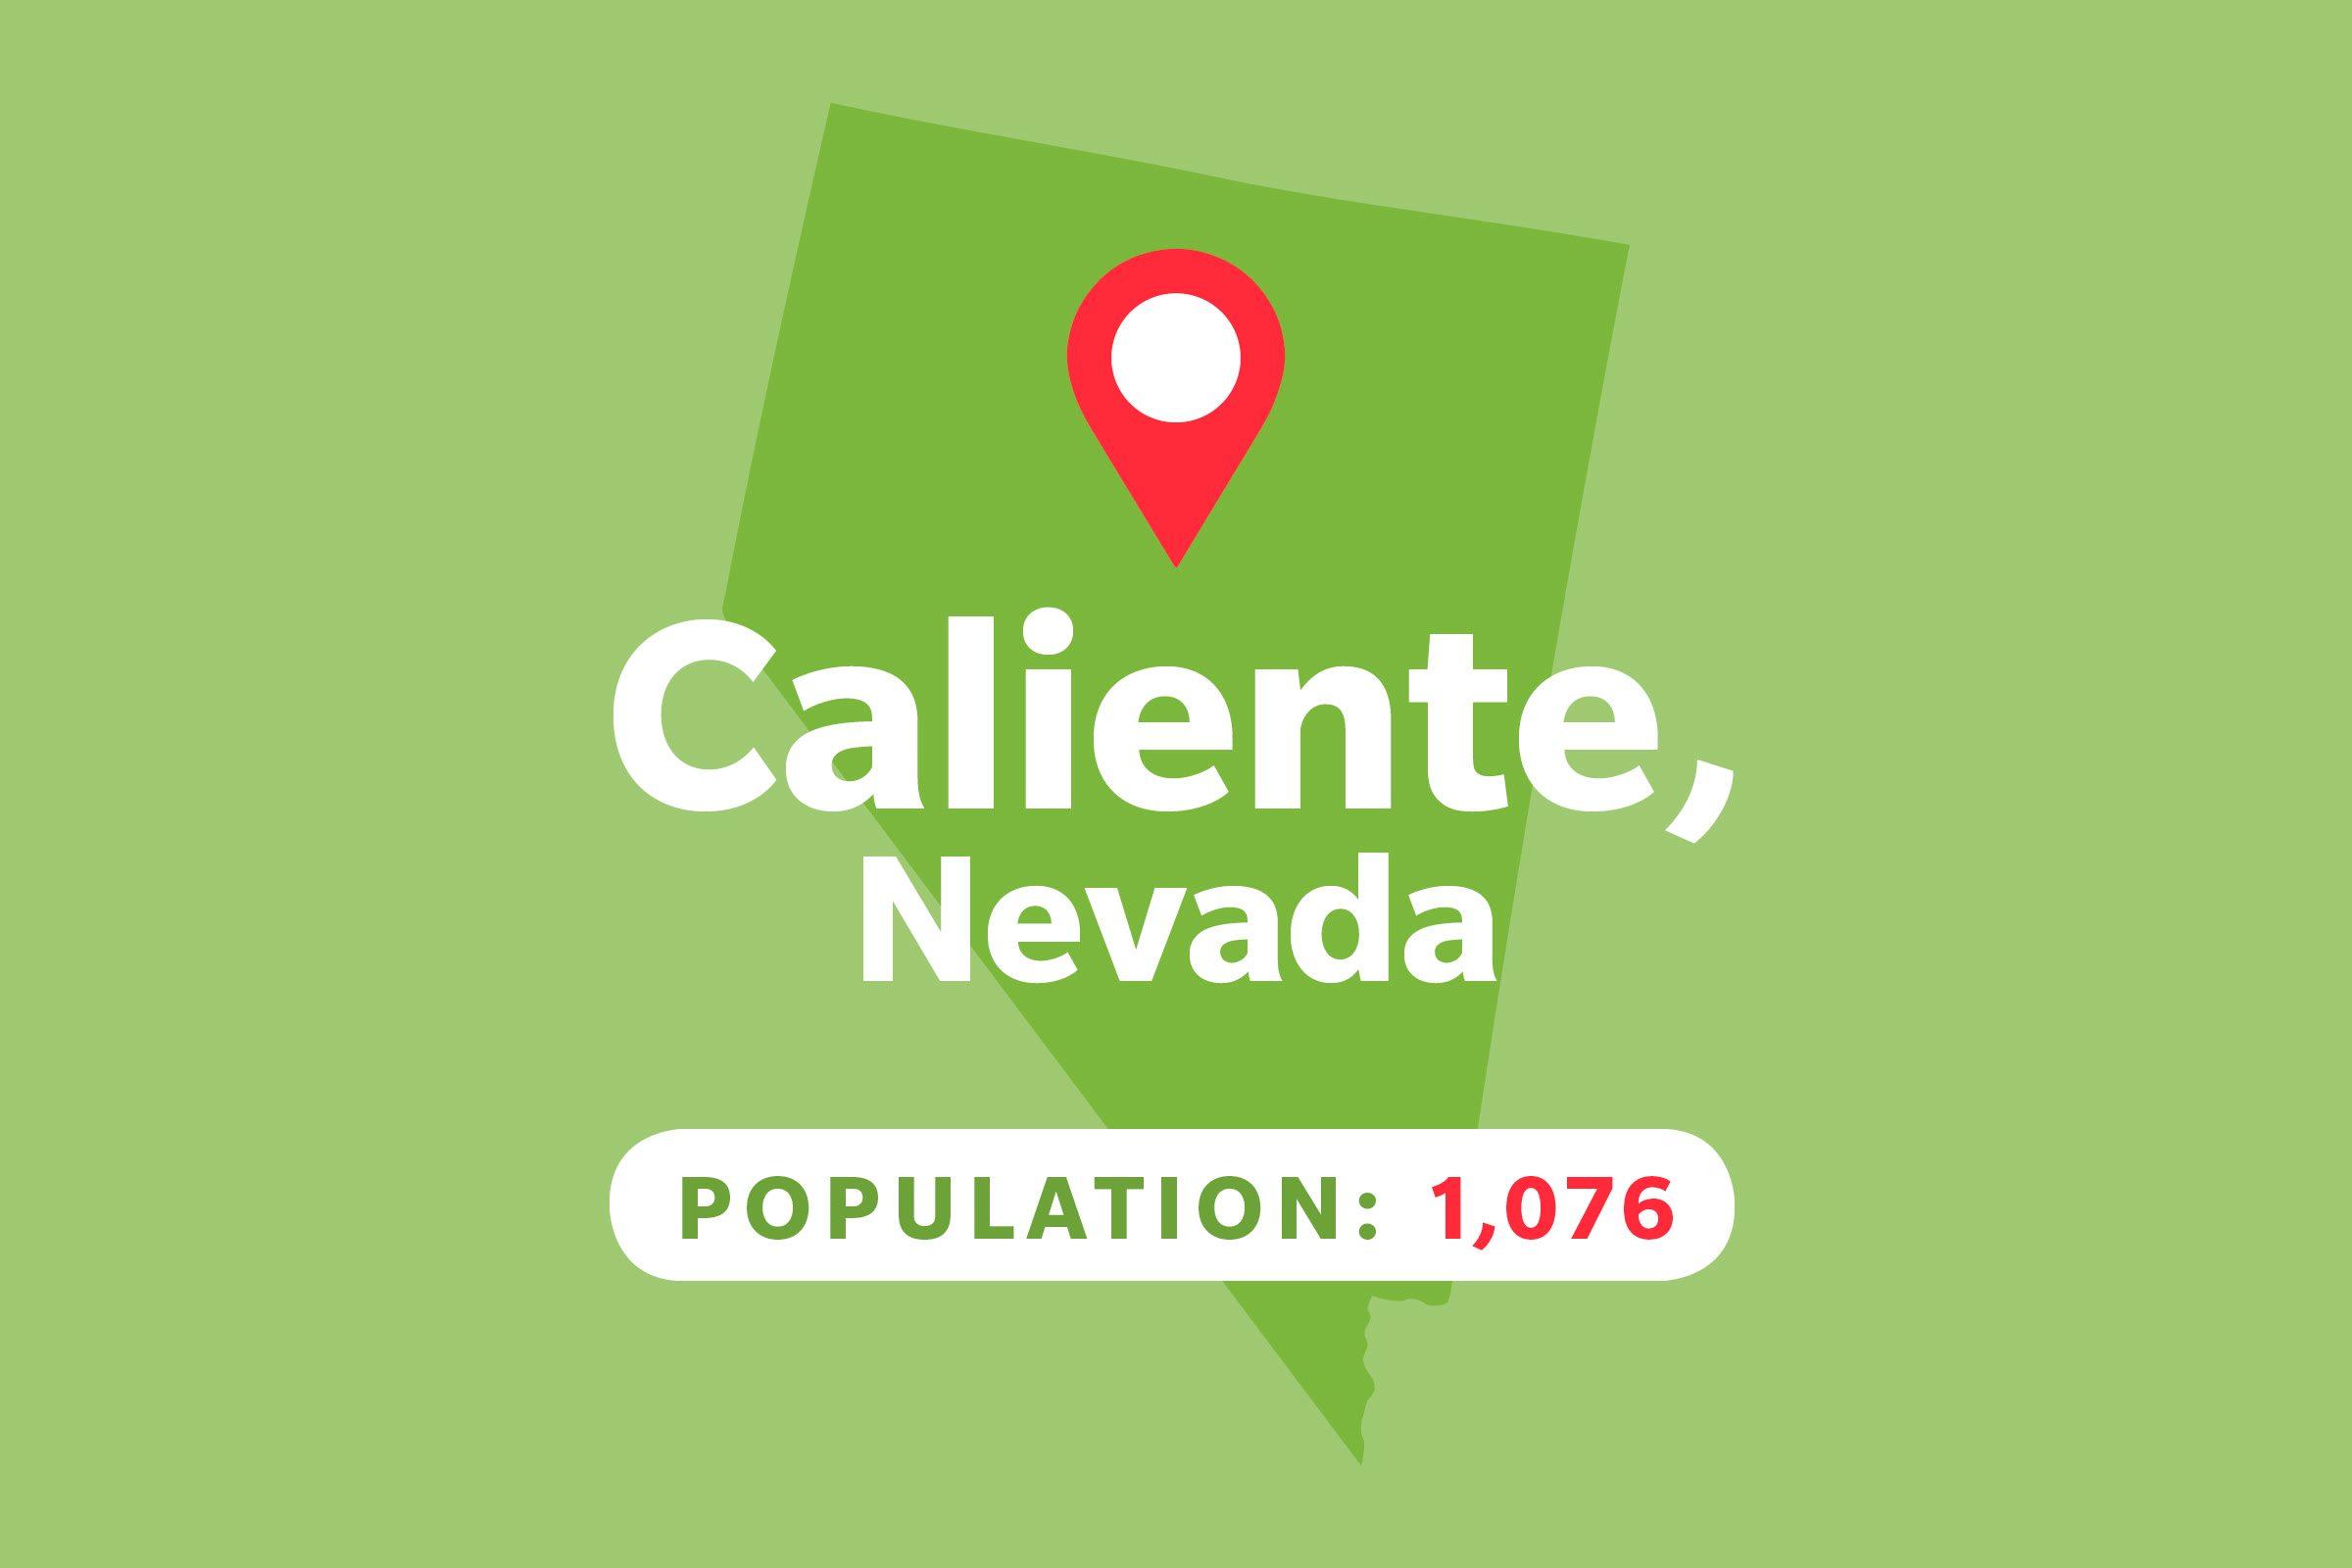 Caliente, Nevada